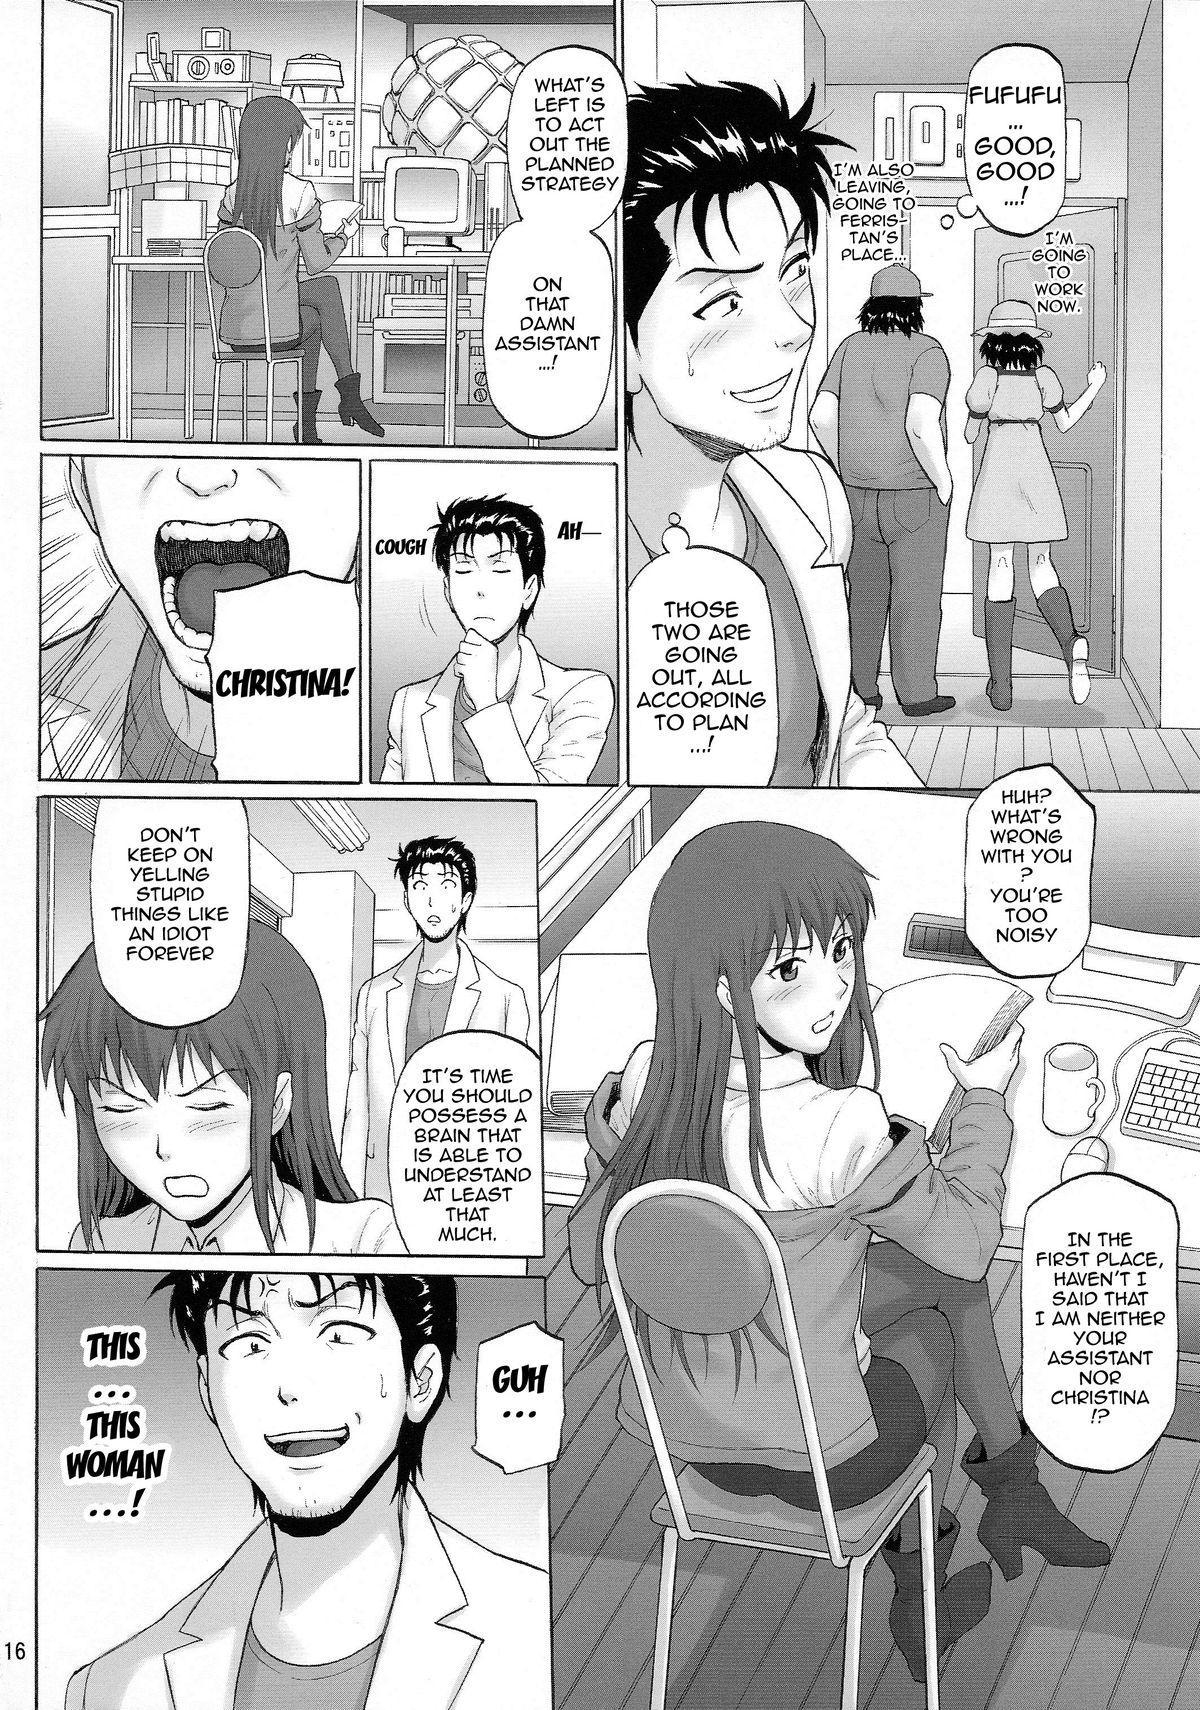 Kyousha Initsu no Homeostasis | Lewd Luxury of Homeostasis 15